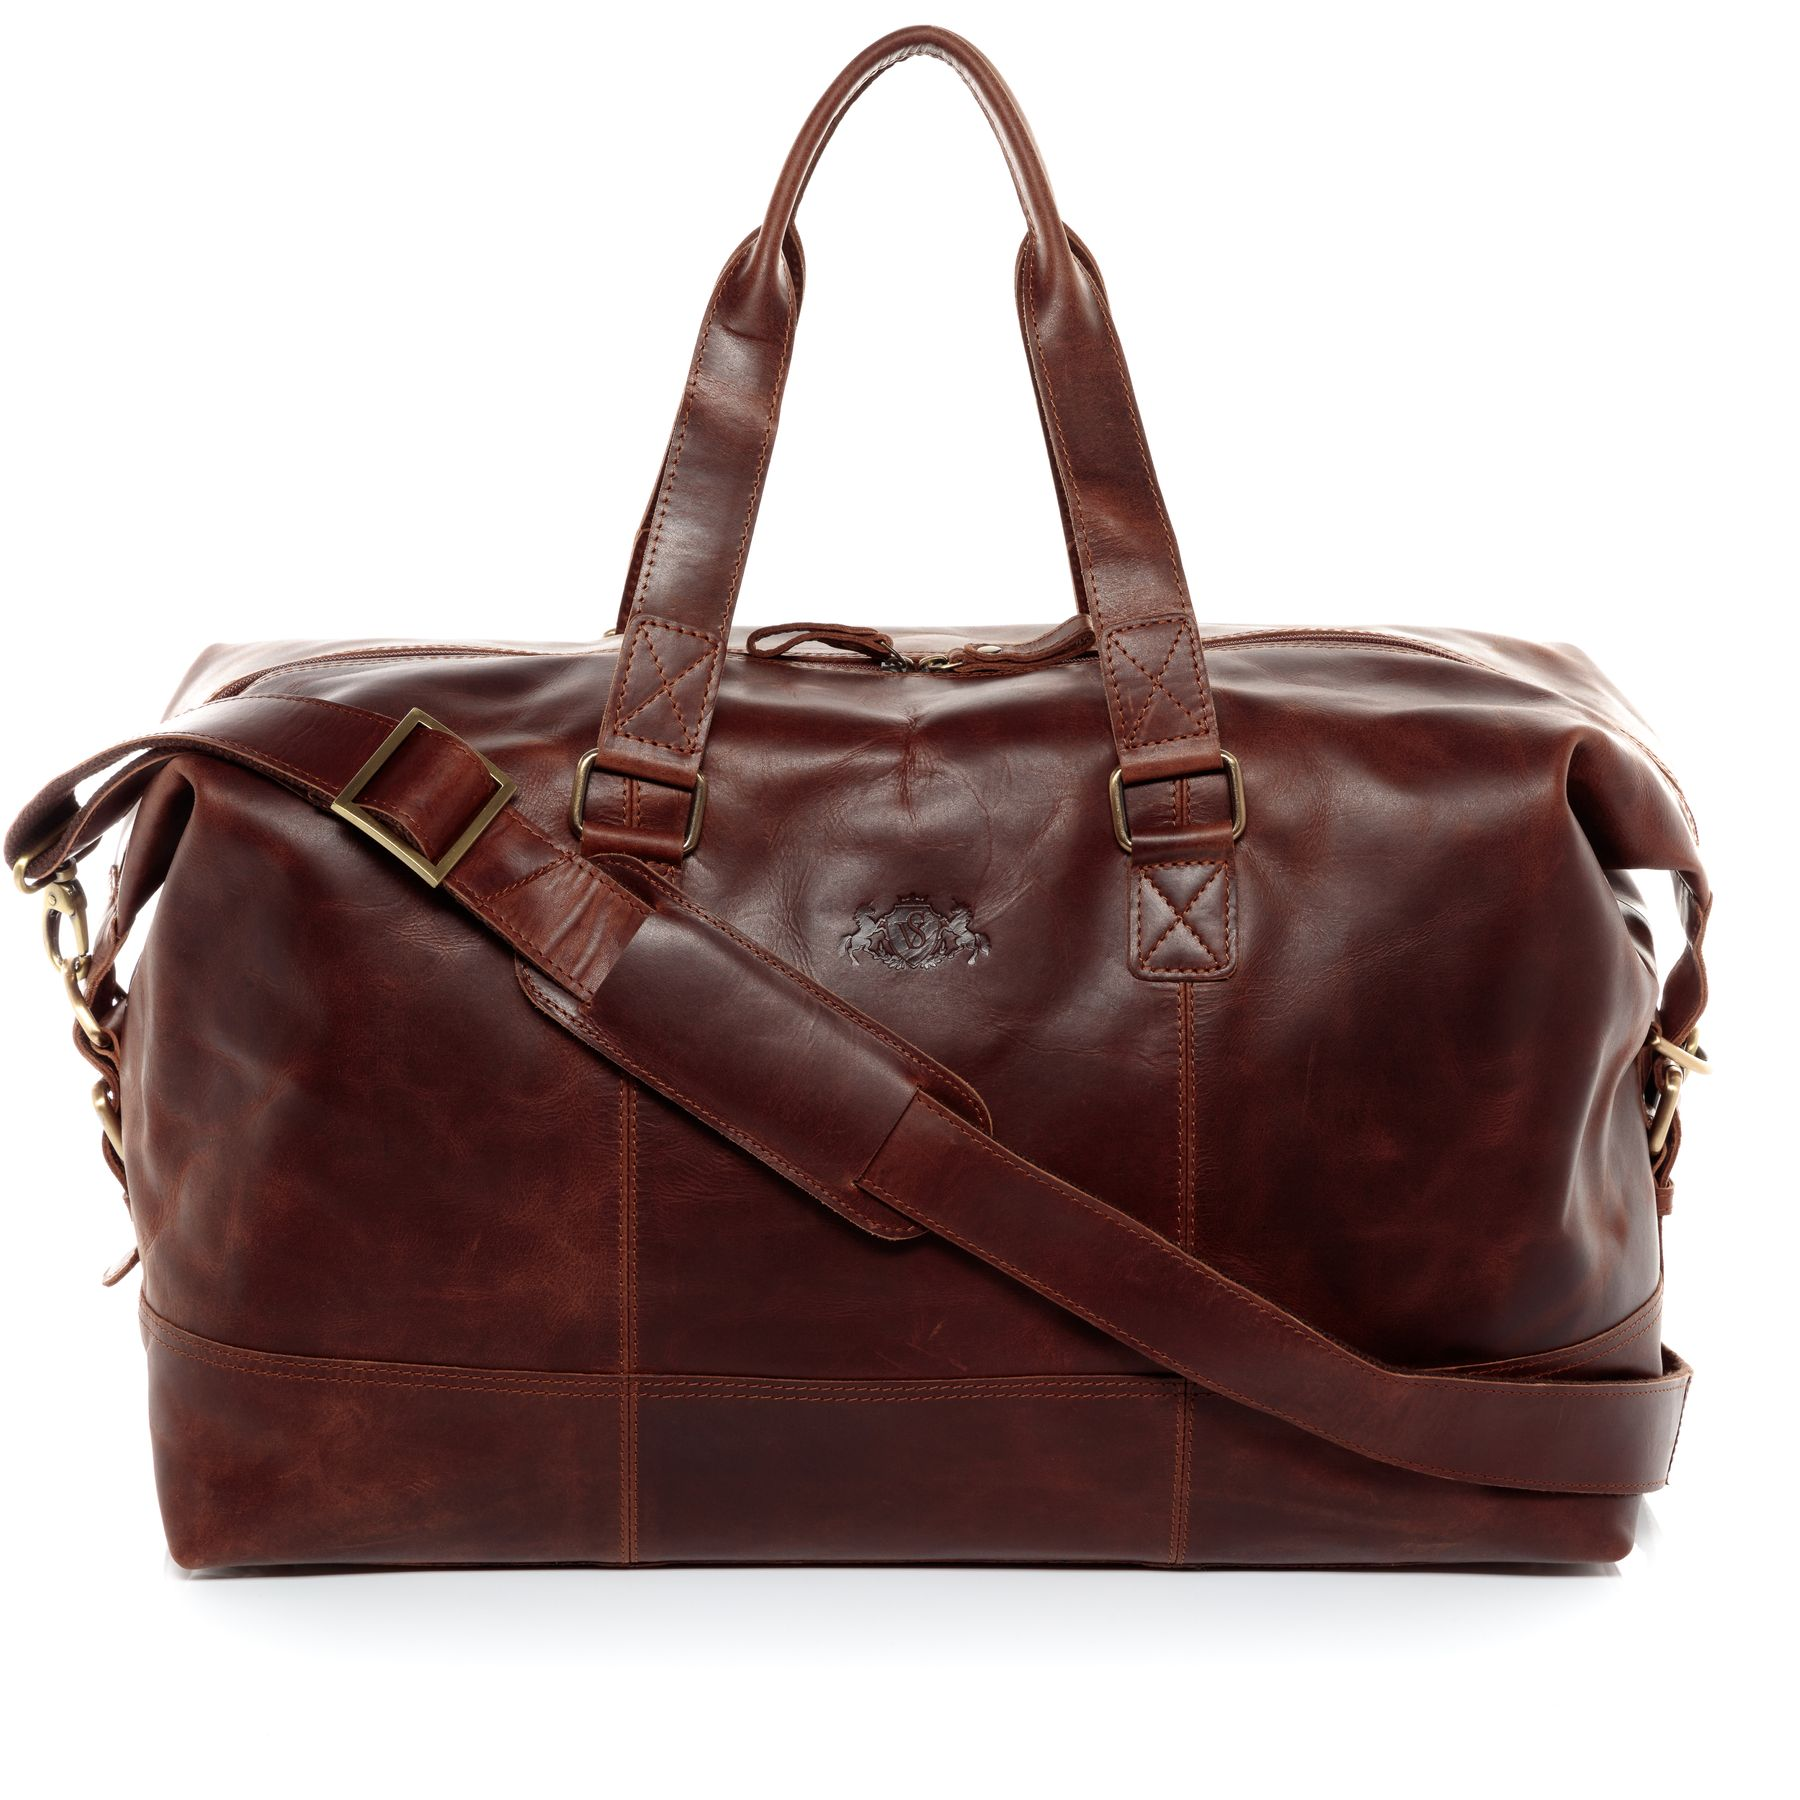 9aa538a6ea SID & VAIN sac de voyage cuir marron fourre-tout besace week-end sac sport  bagages cabine à main Sacs de voyage Sacs de sport